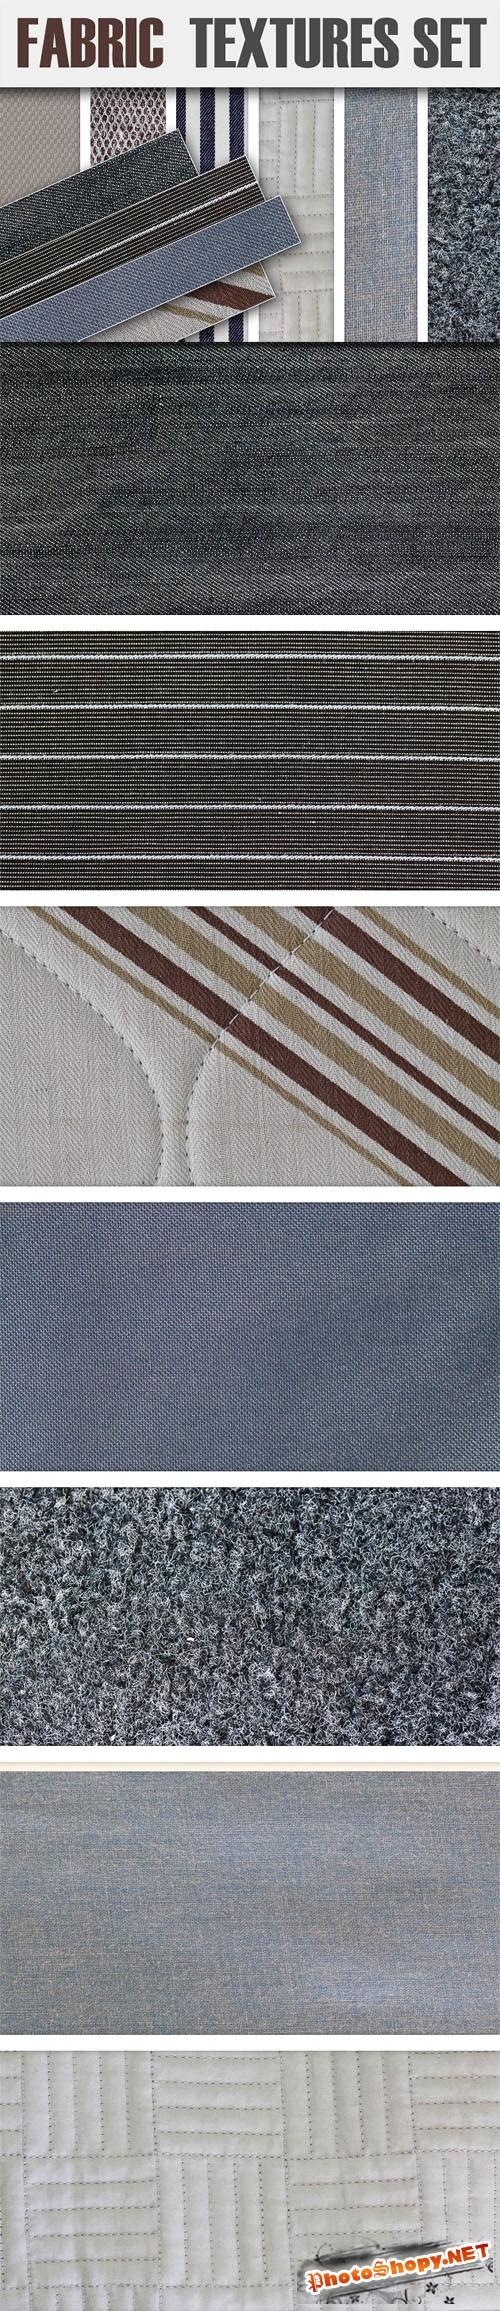 Designtnt - Fabric Textures